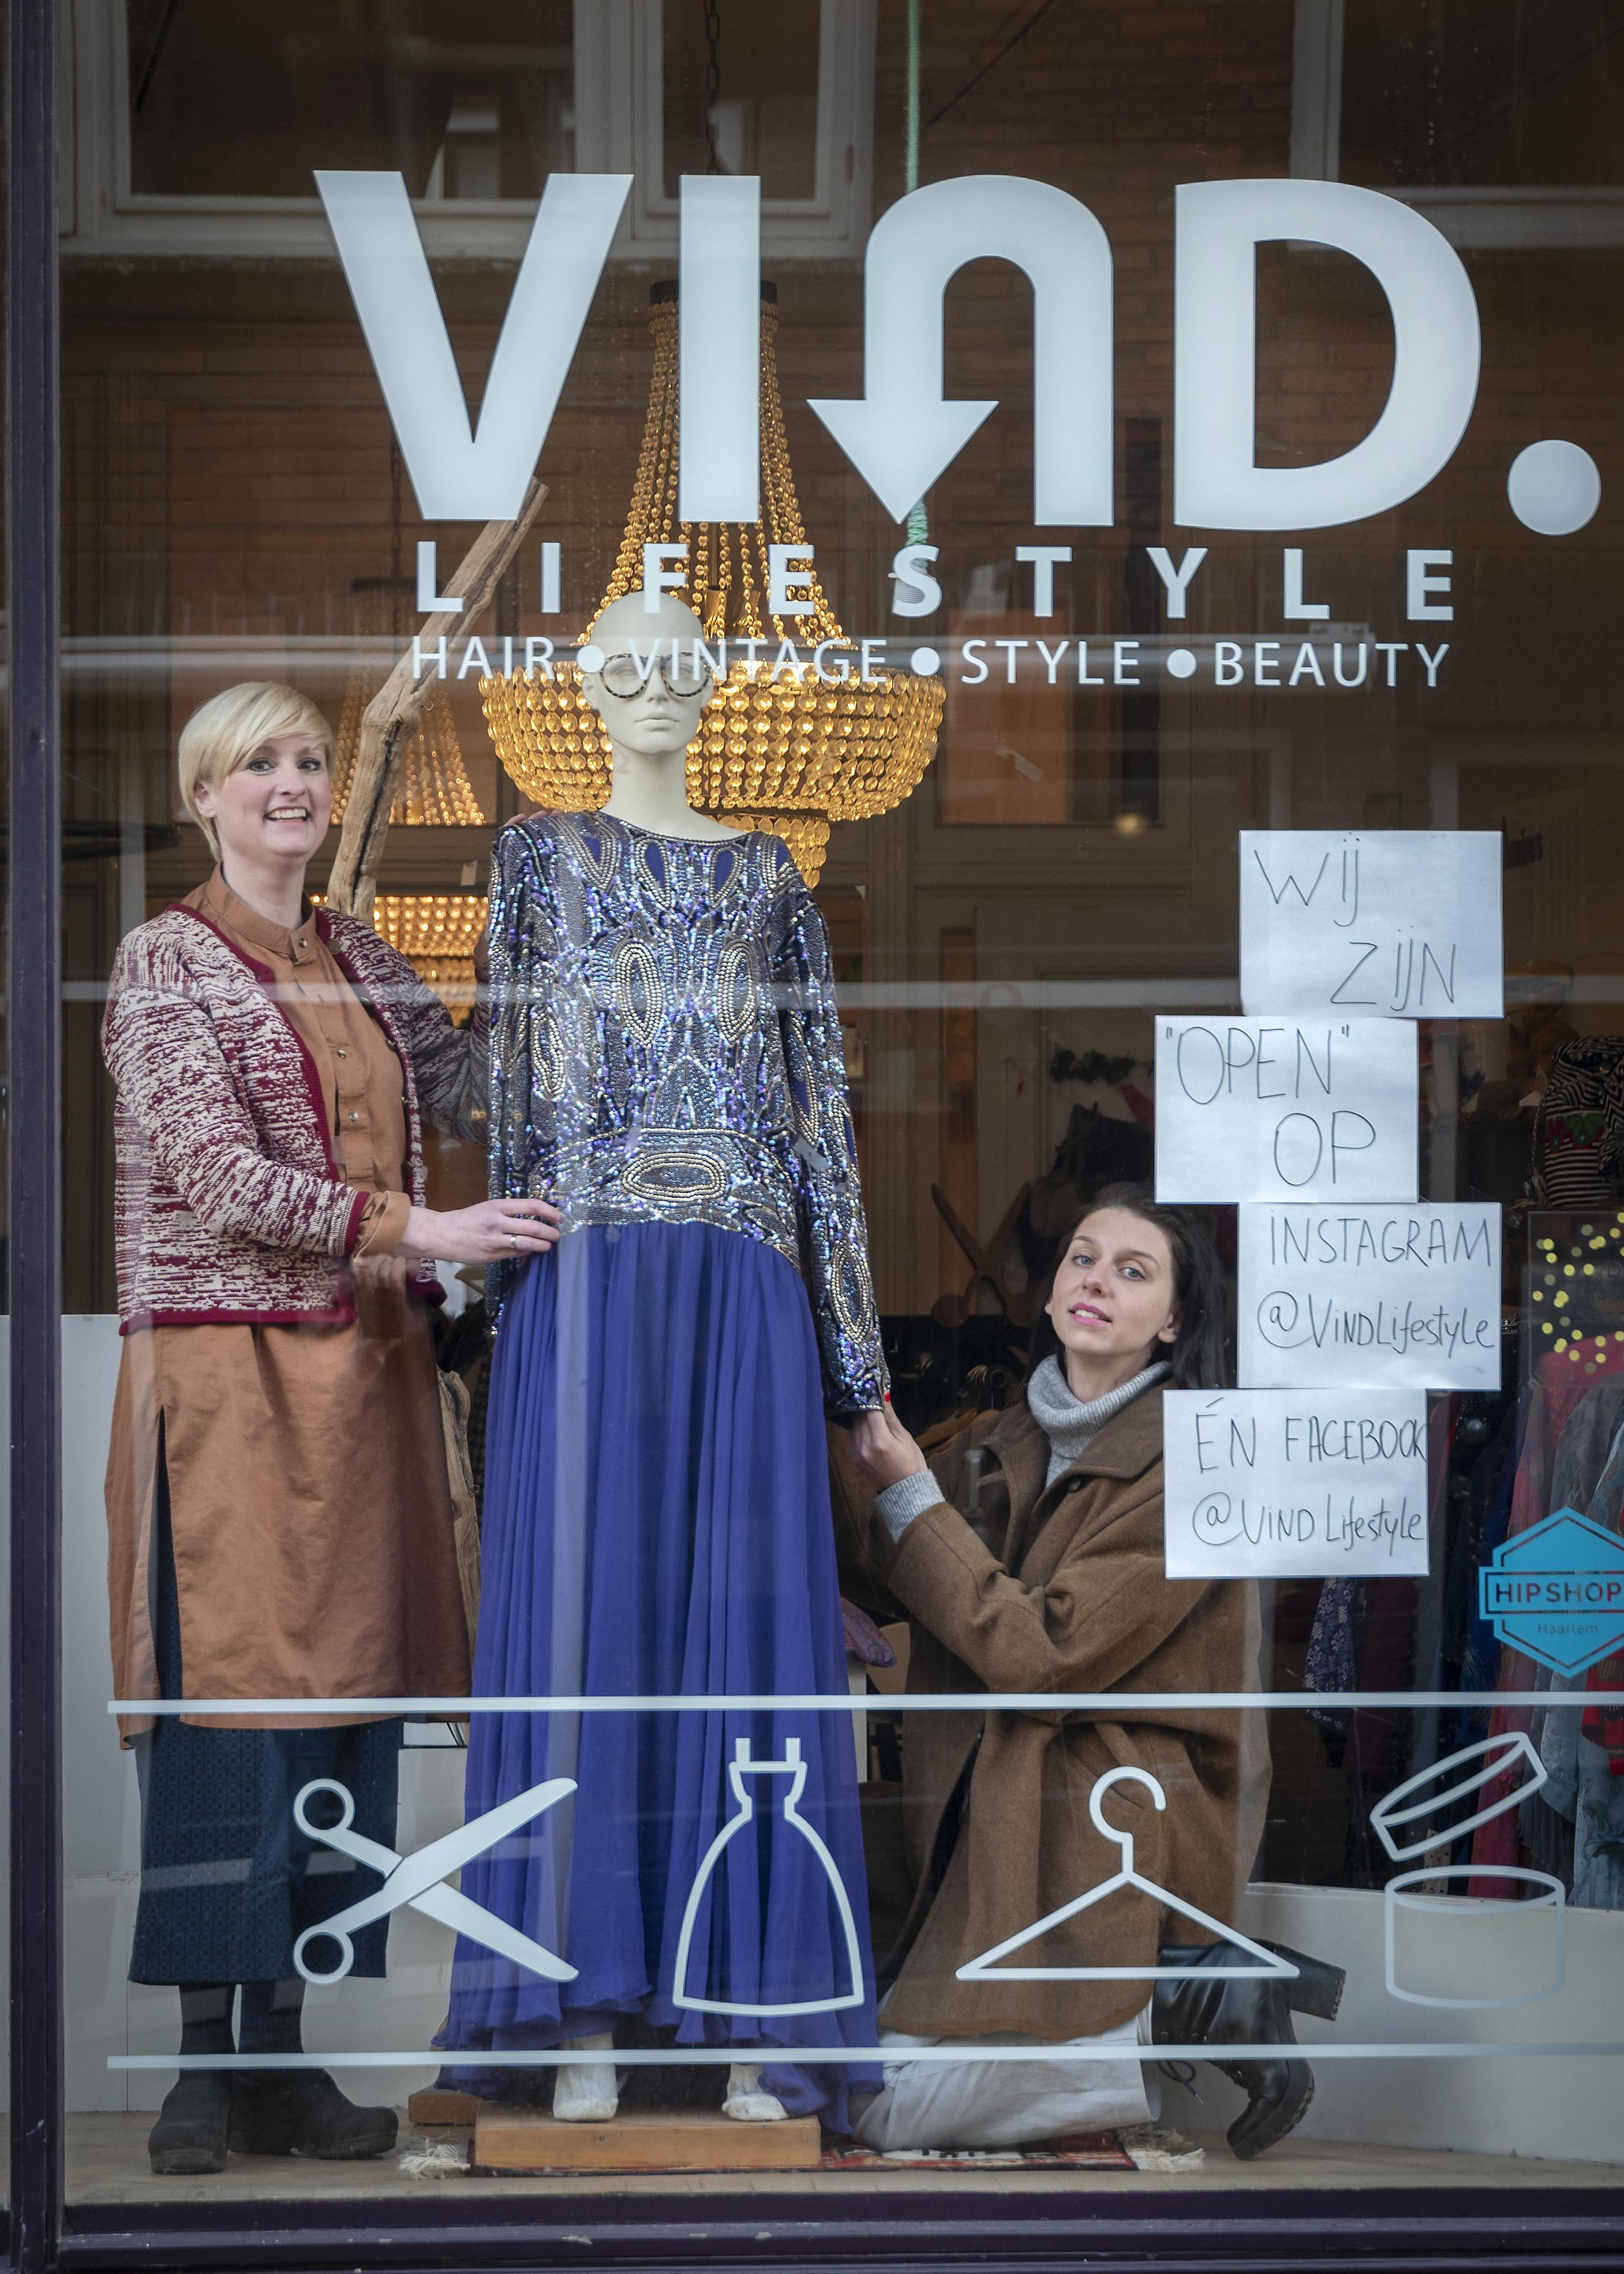 Didi viert 10-jarig bestaan van vintagewinkel in Haarlem met online koopjesdag 'Mode en trends zeggen me niks'